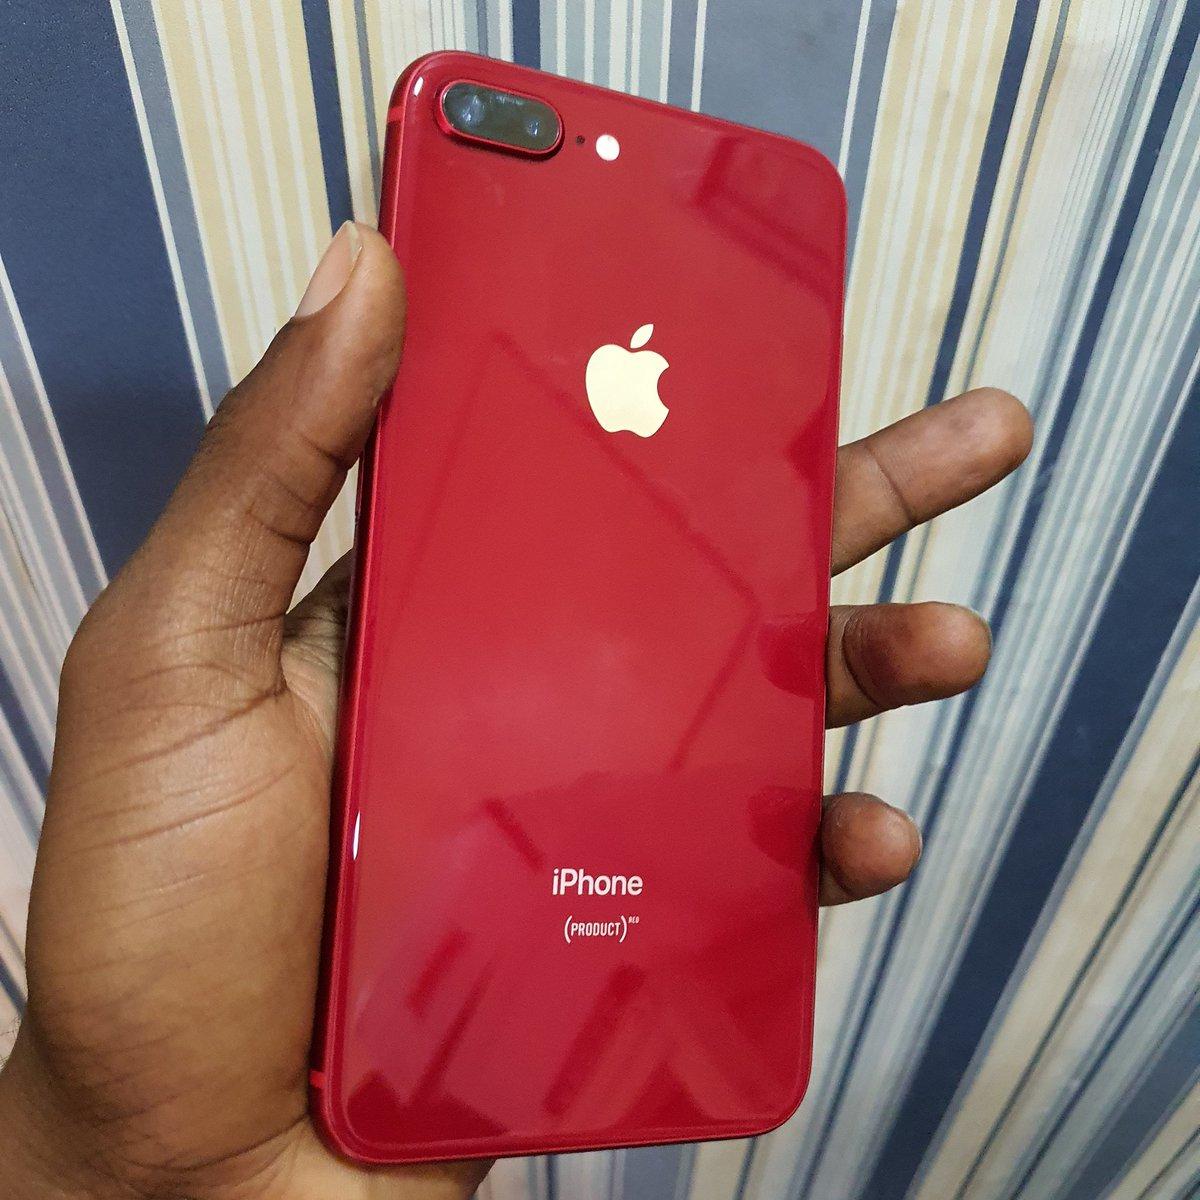 Uk used iPhone 8plus RED 256gb..PRICE:140,000..#hotdeals #apple #RED #gadgetshop #cruxconnect #sharpliknewpic.twitter.com/TKnBT6ZNOJ